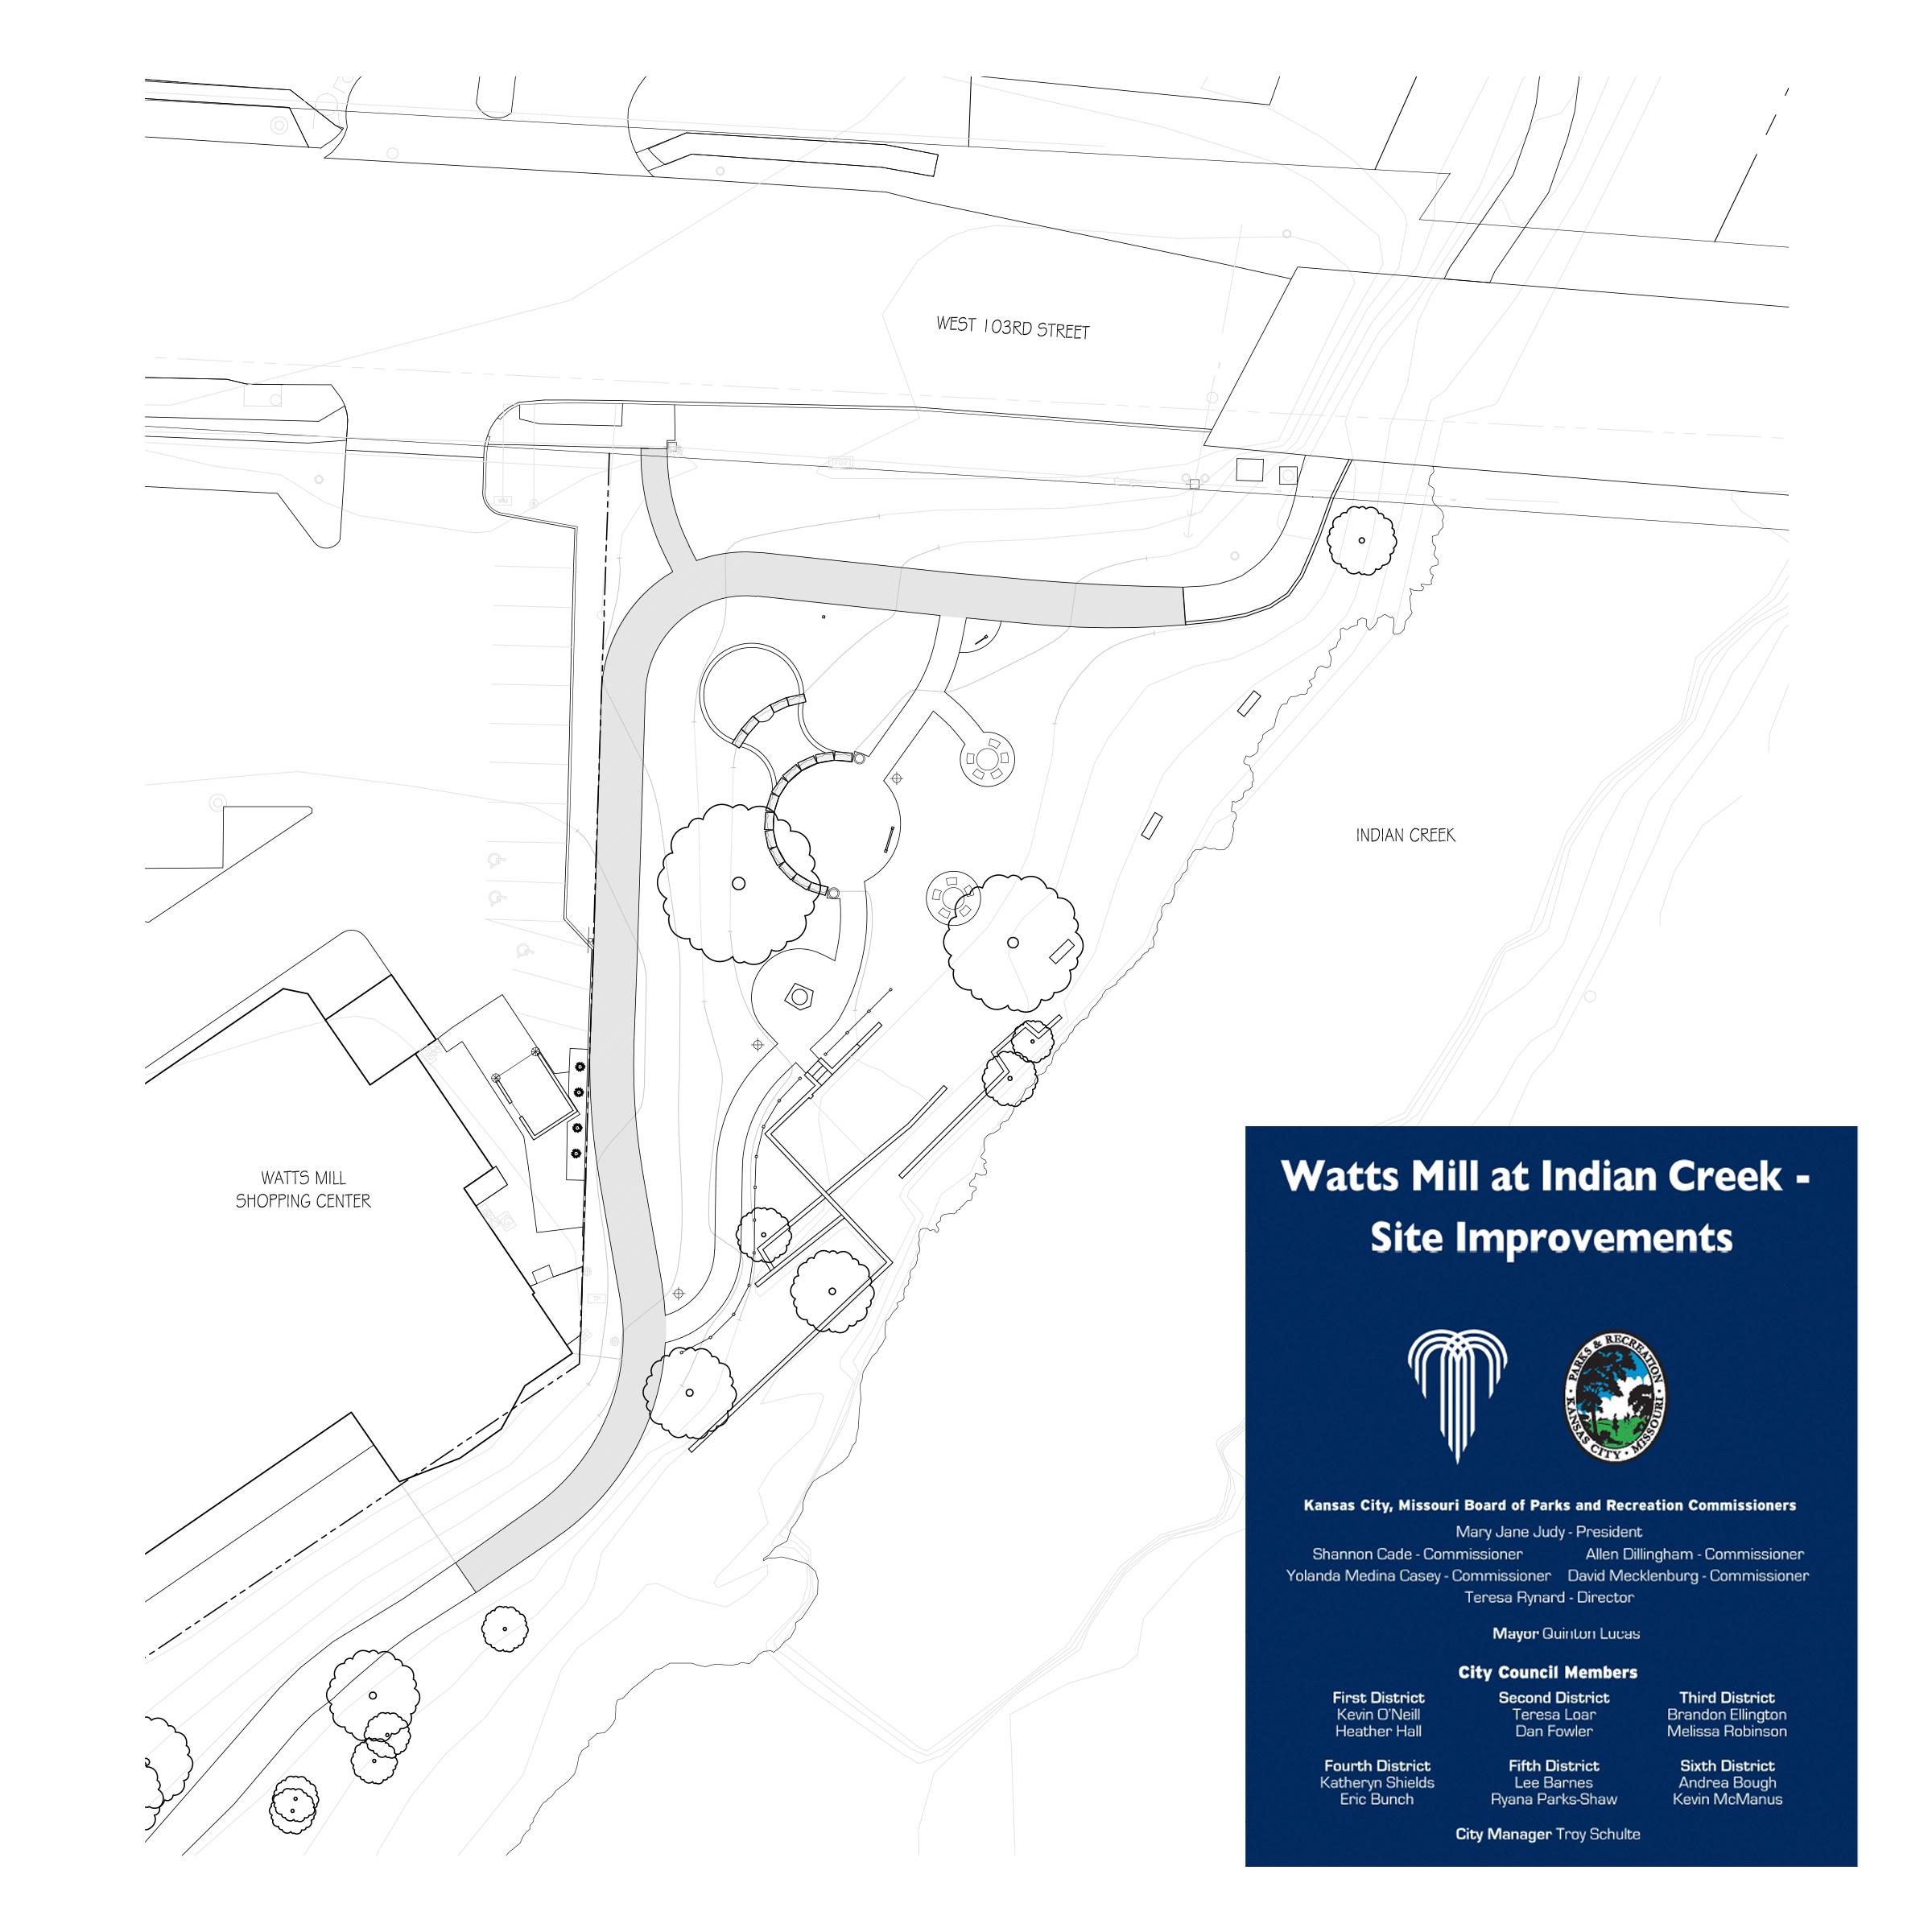 Watts Mill at Indian Creek Map